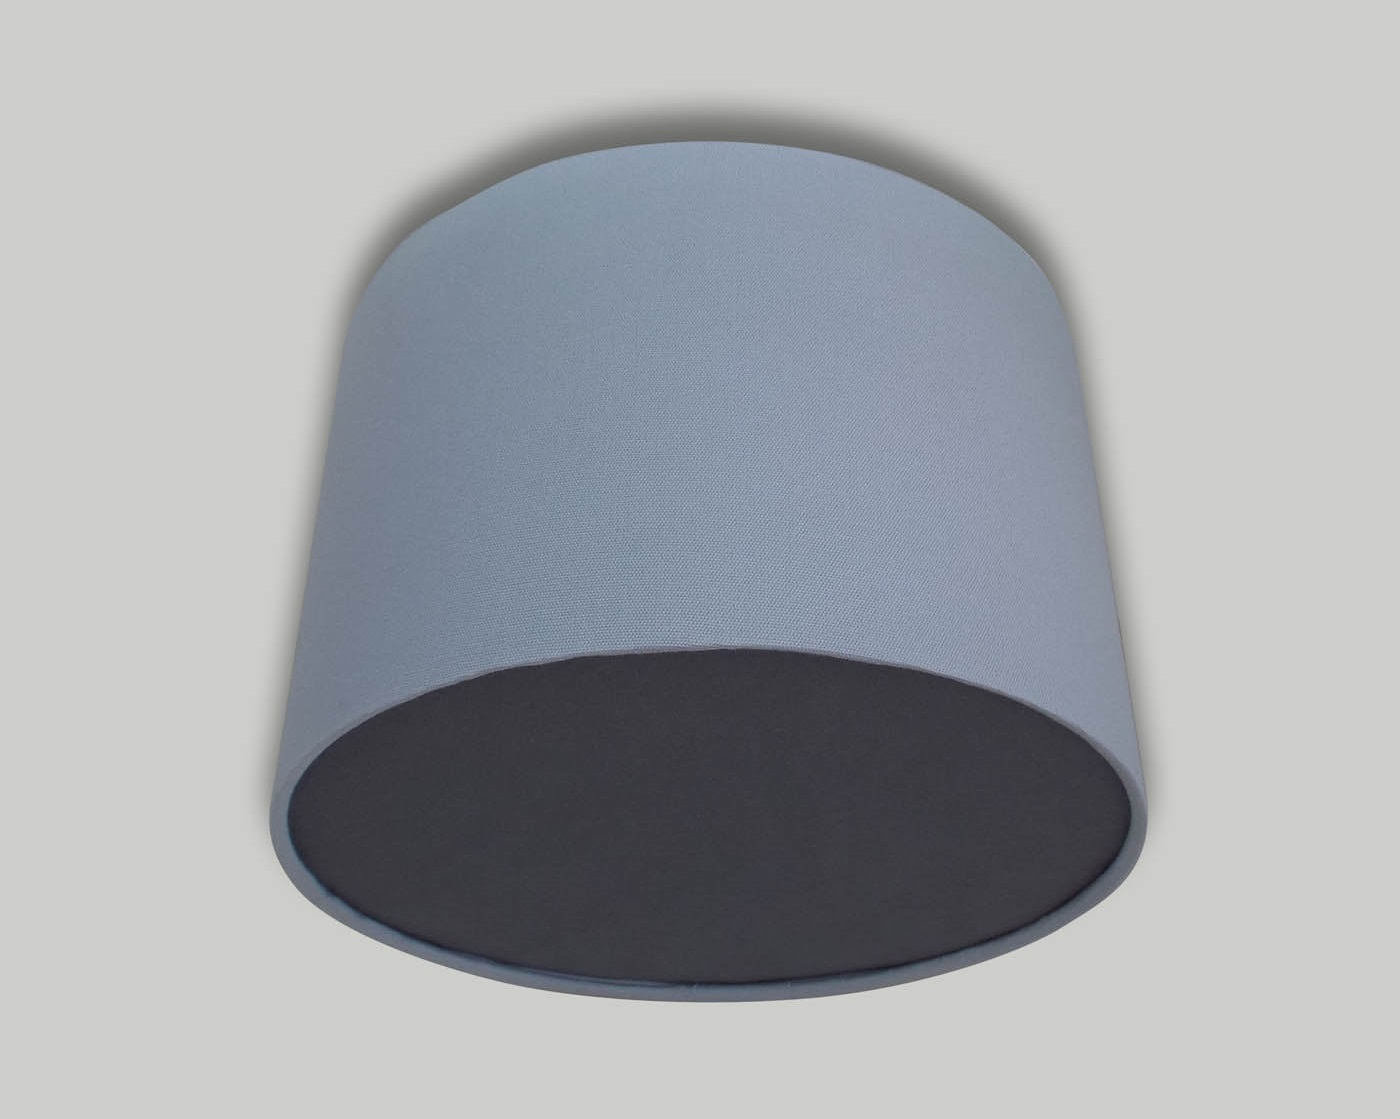 Light grey ceiling drum lampshade dark grey diffuser the lampshade light grey ceiling drum lampshade dark grey diffuser aloadofball Image collections